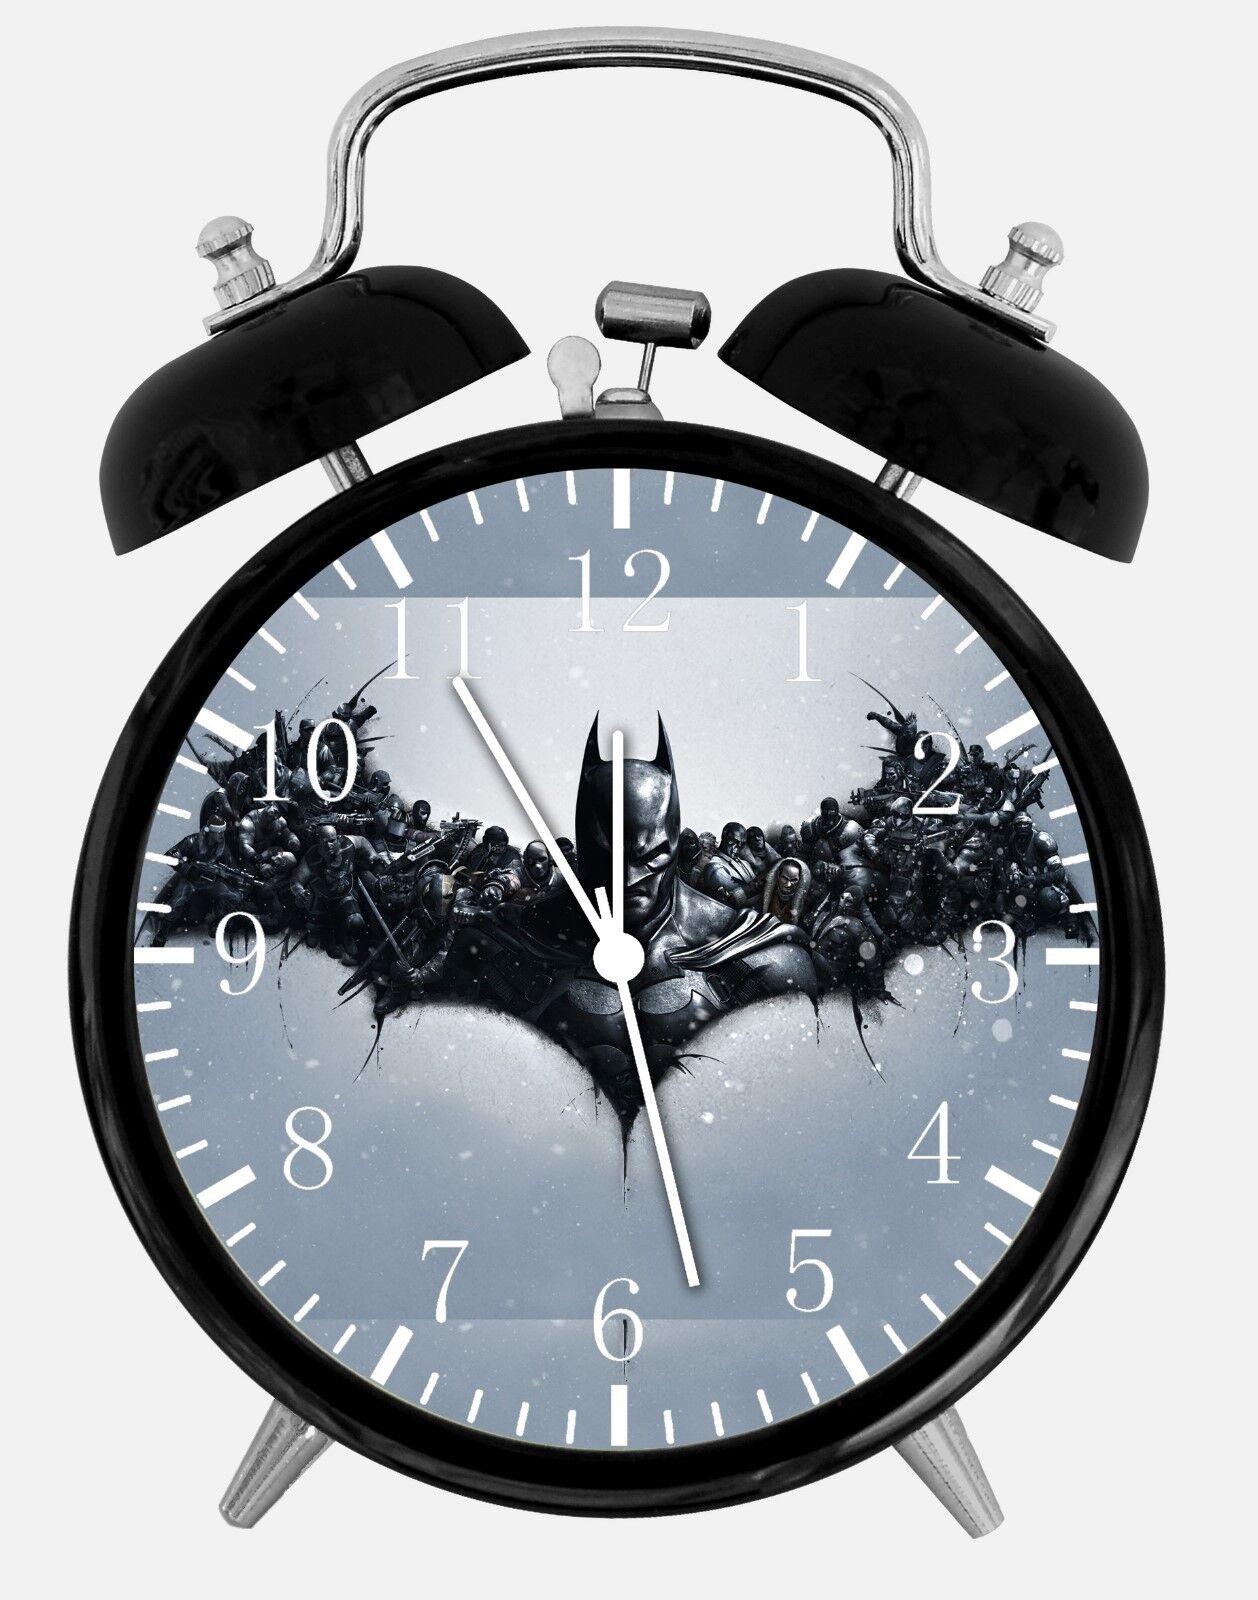 "Batman Alarm Desk Clock 3.75"" Room Office Decor E58 A Nice Gift"